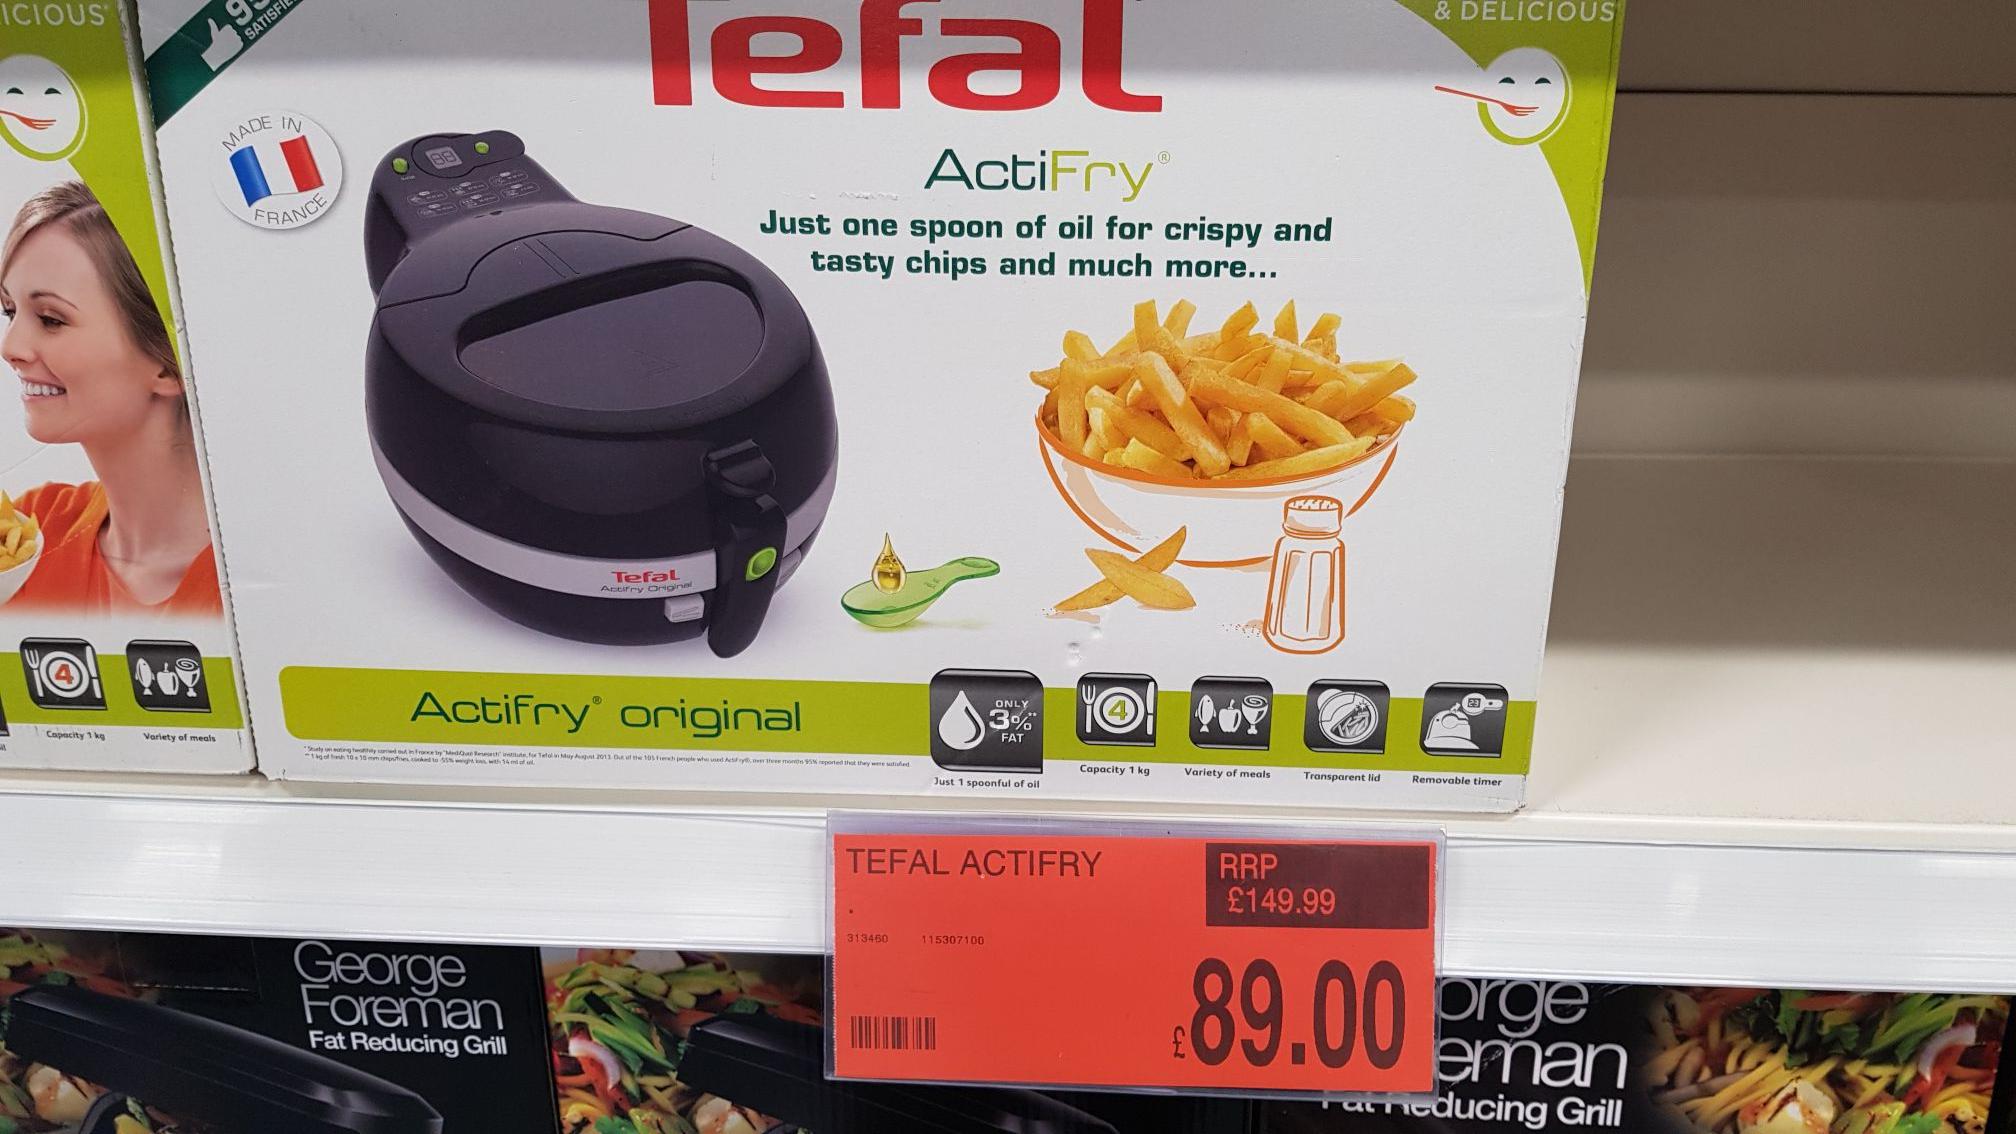 Tefal Actifry original 1kg £89 @ B&M